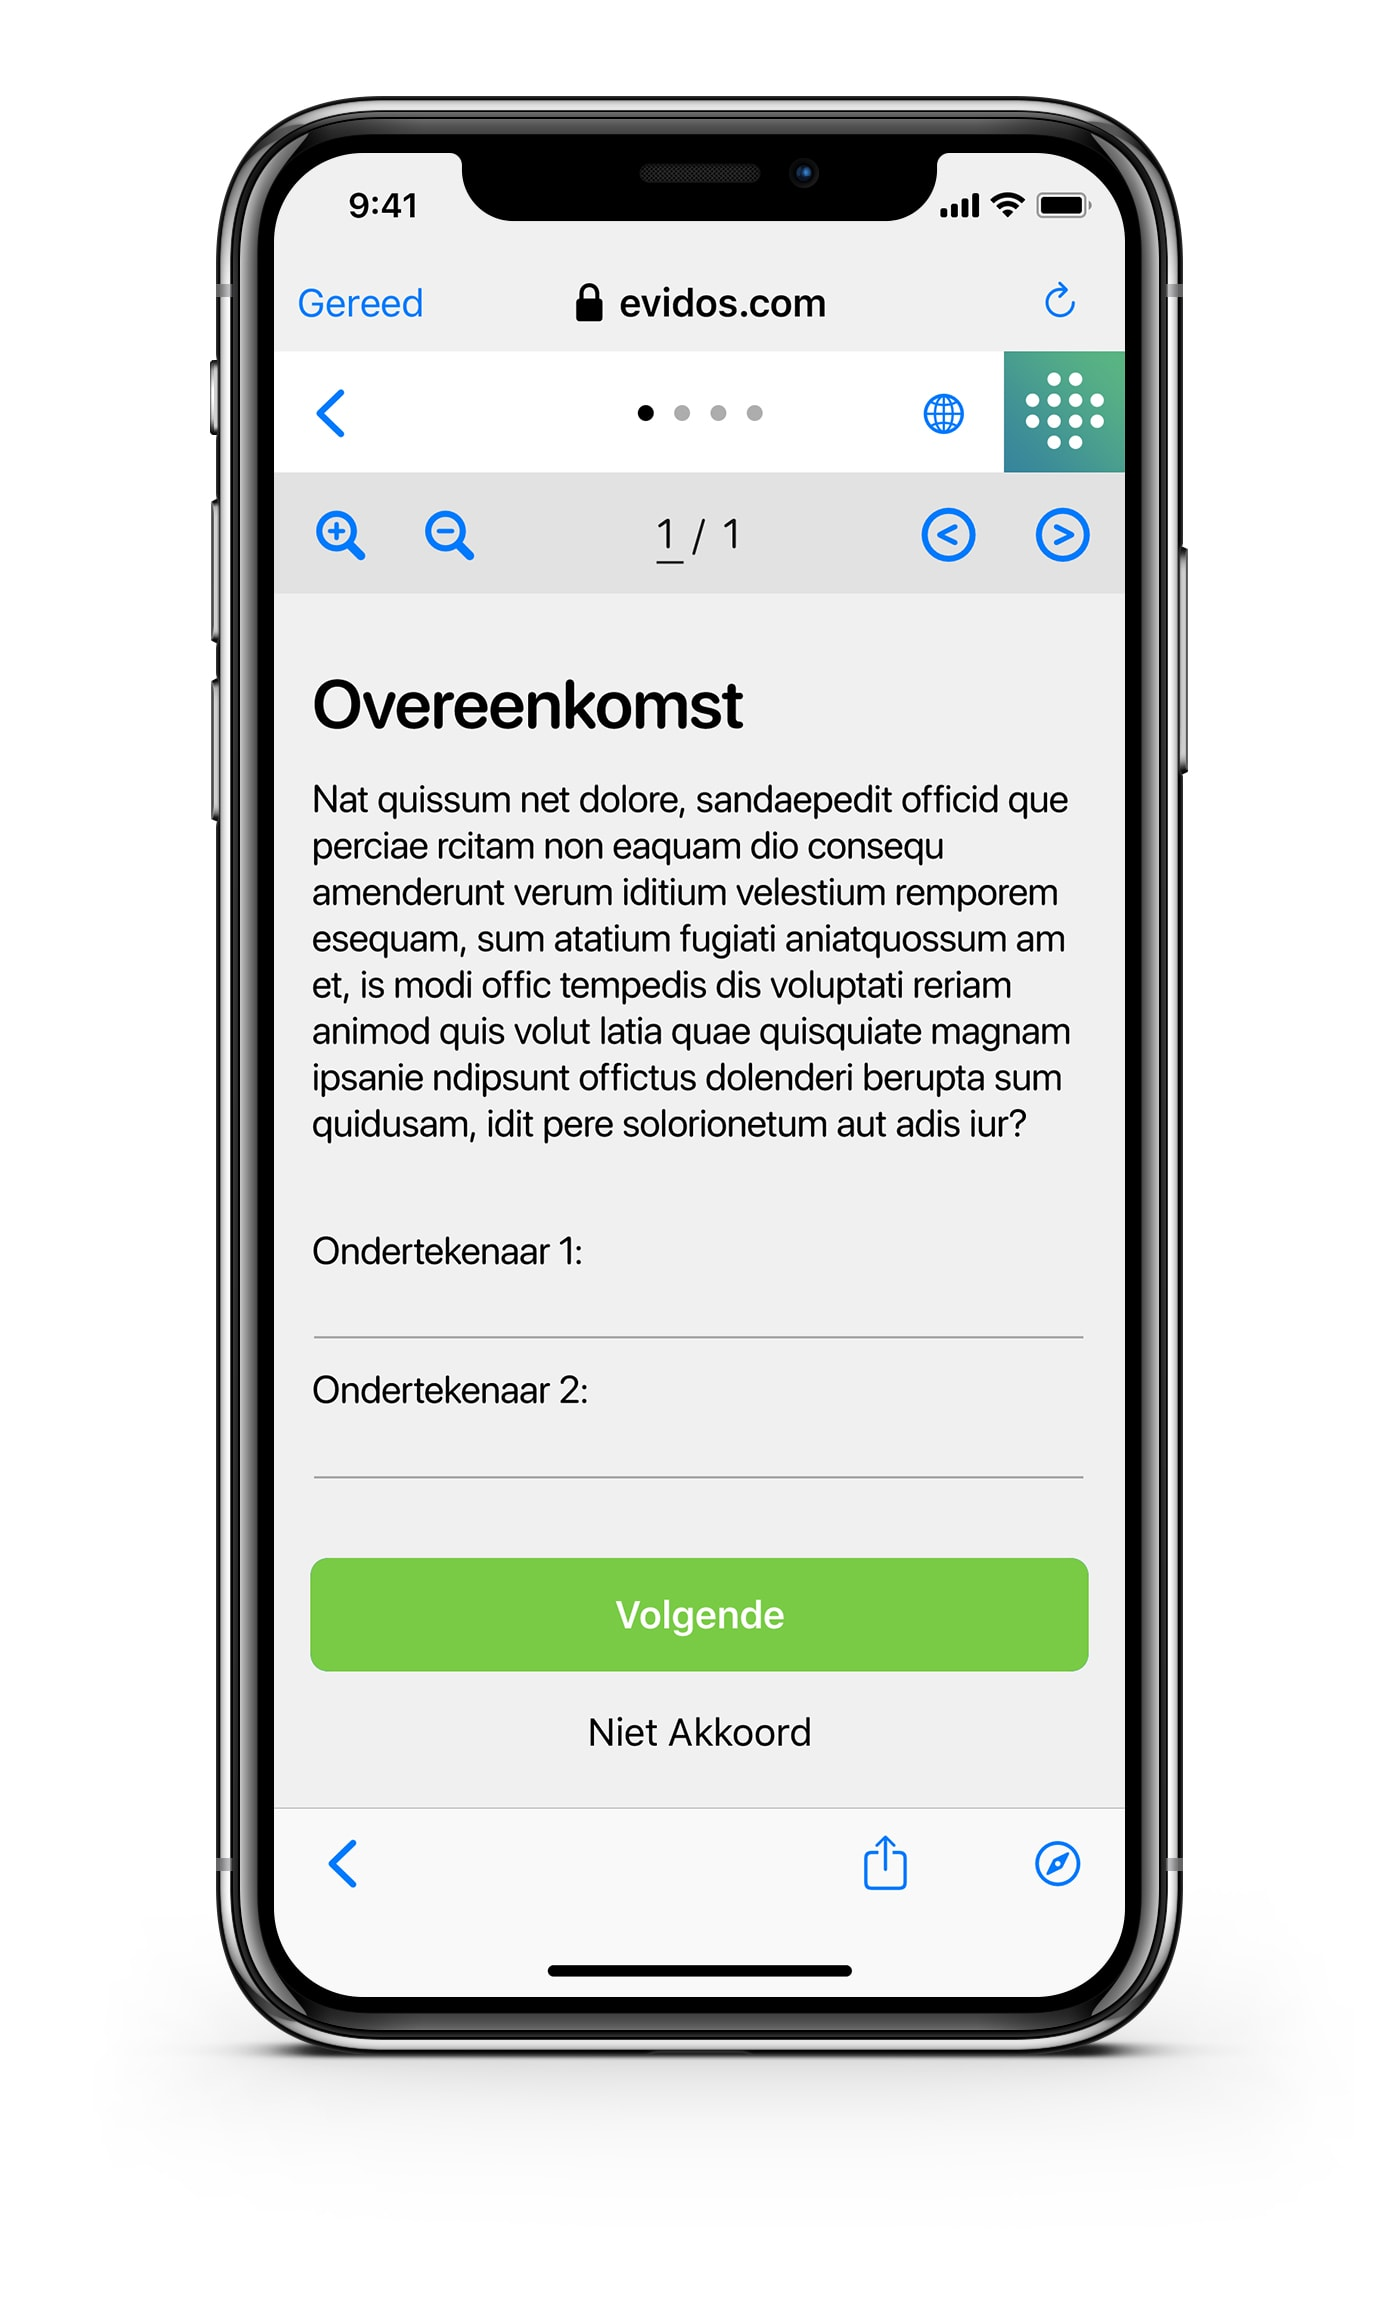 Ondertekenen - NL - stap 1